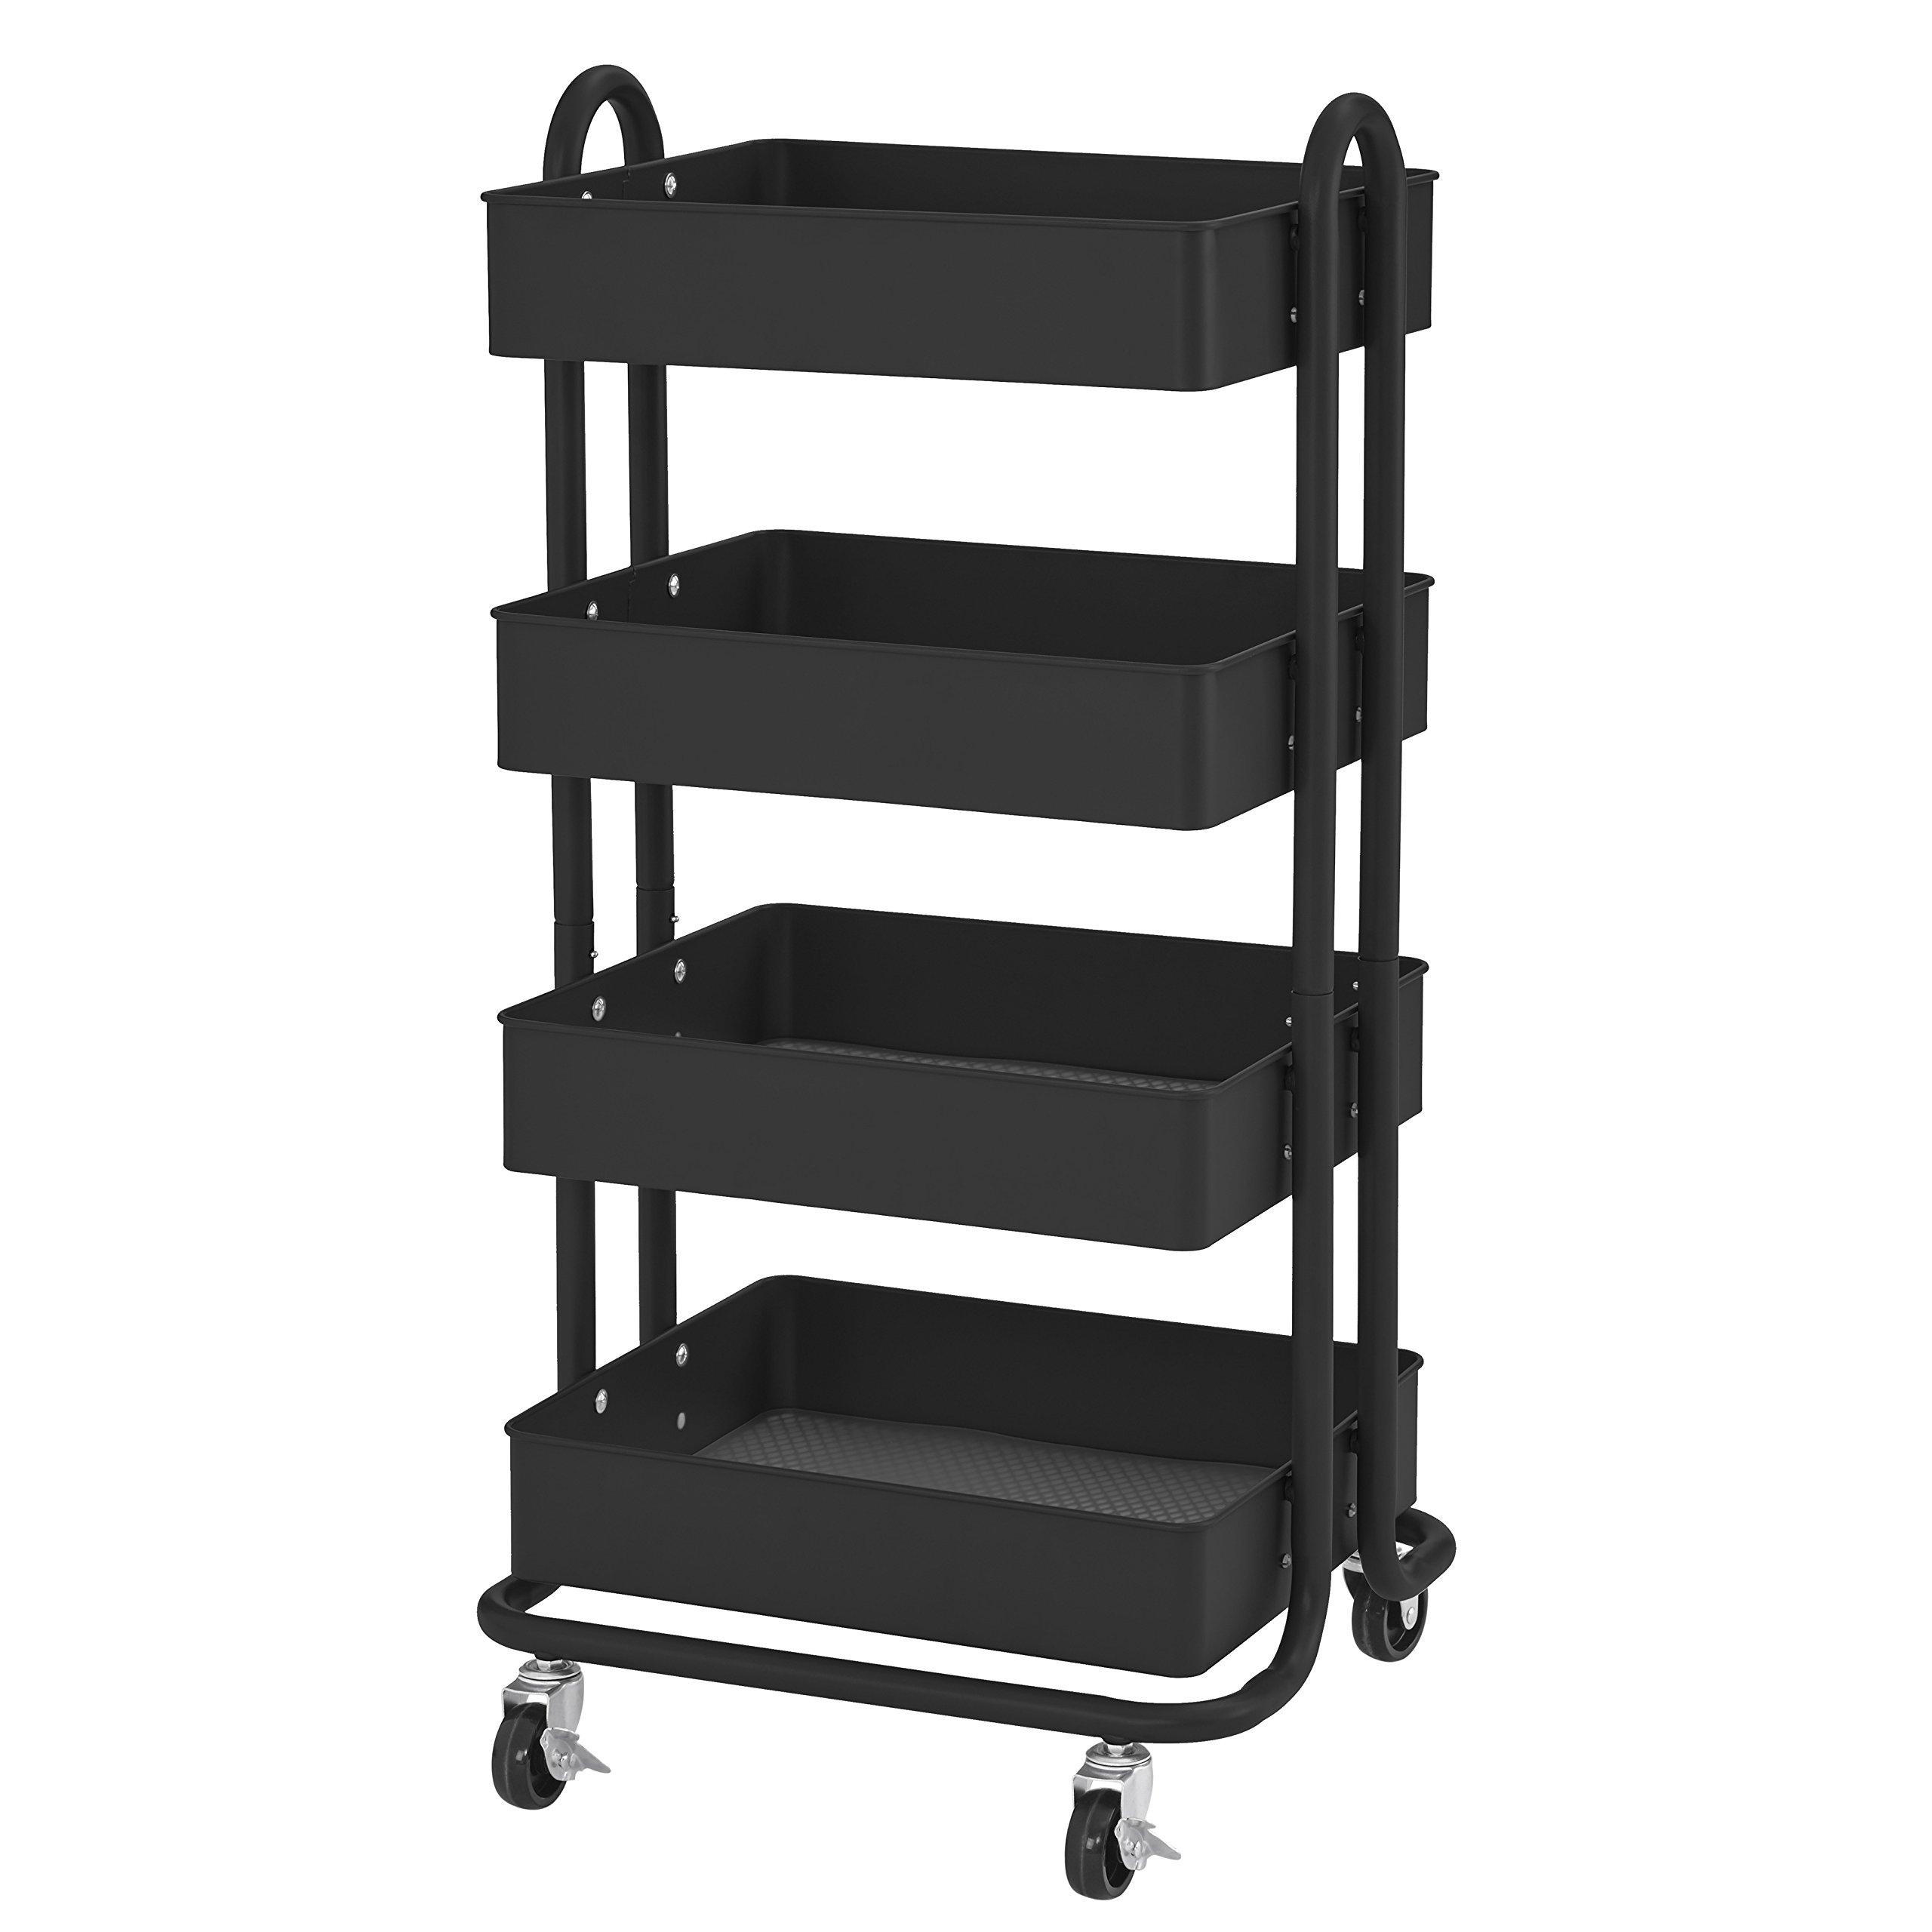 ECR4Kids 4-Tier Metal Rolling Utility Cart - Heavy Duty Mobile Storage Organizer, Black